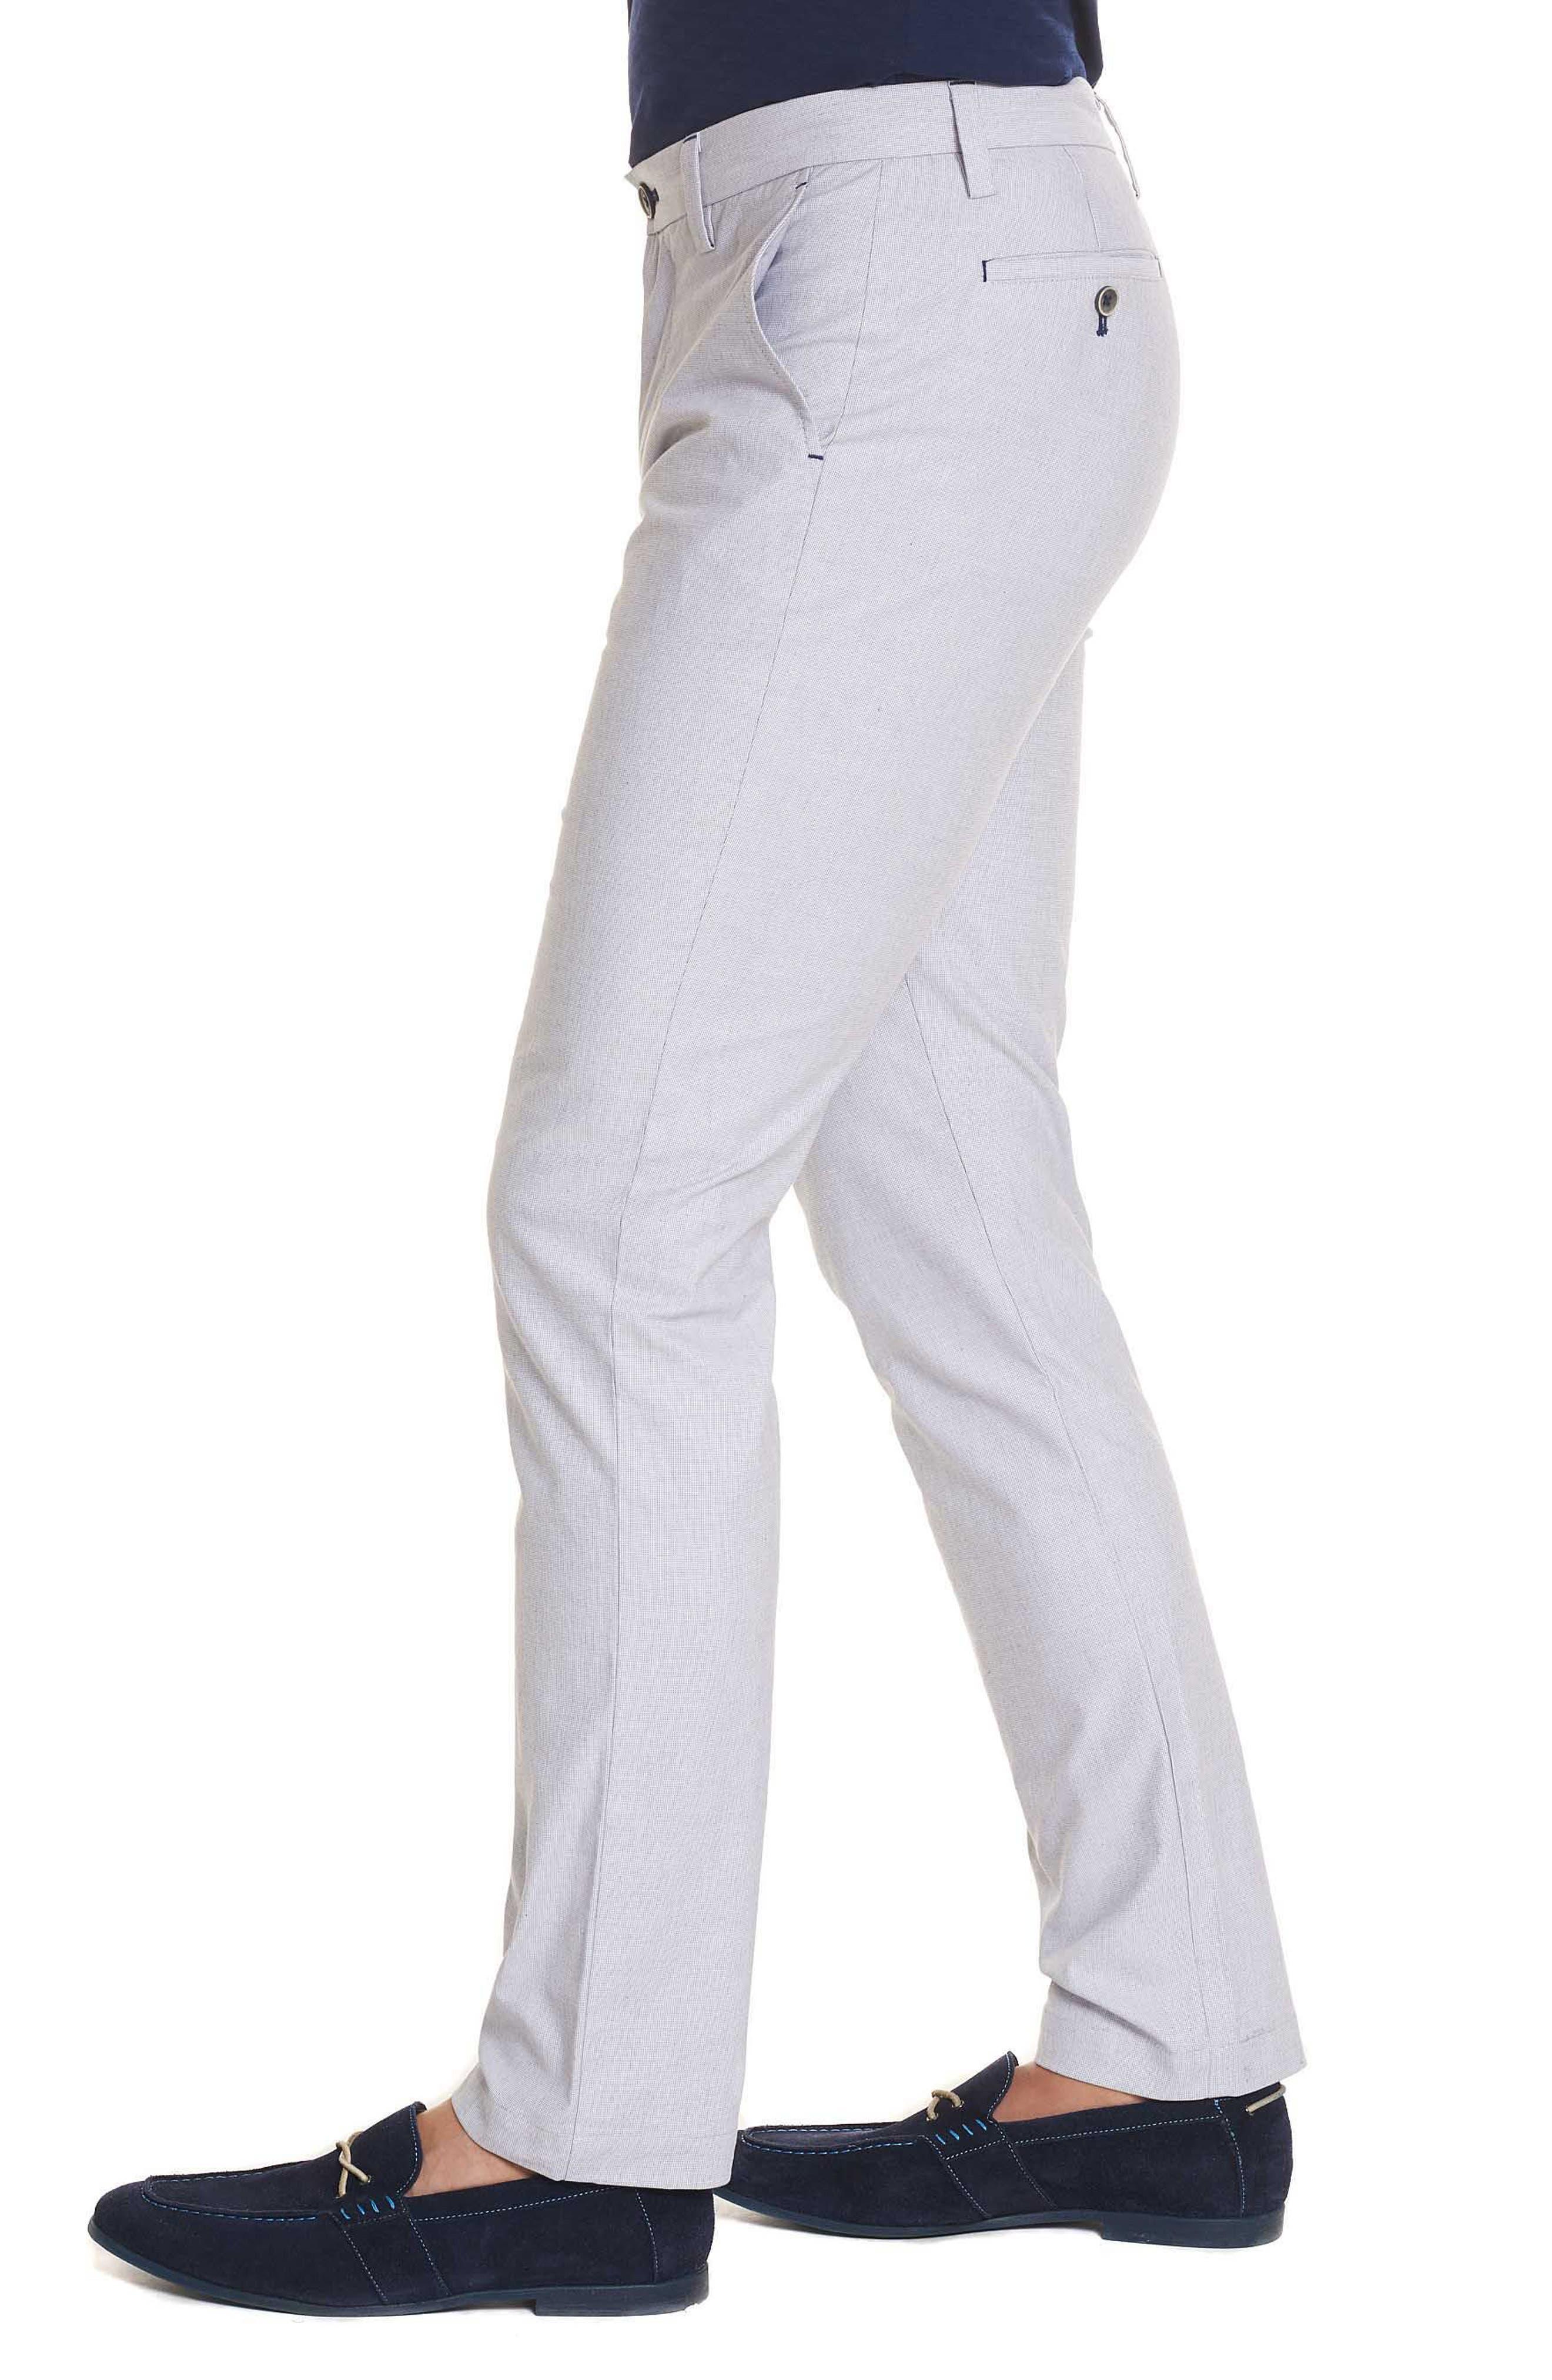 Gerardo Tailored Fit Pants,                             Alternate thumbnail 3, color,                             White